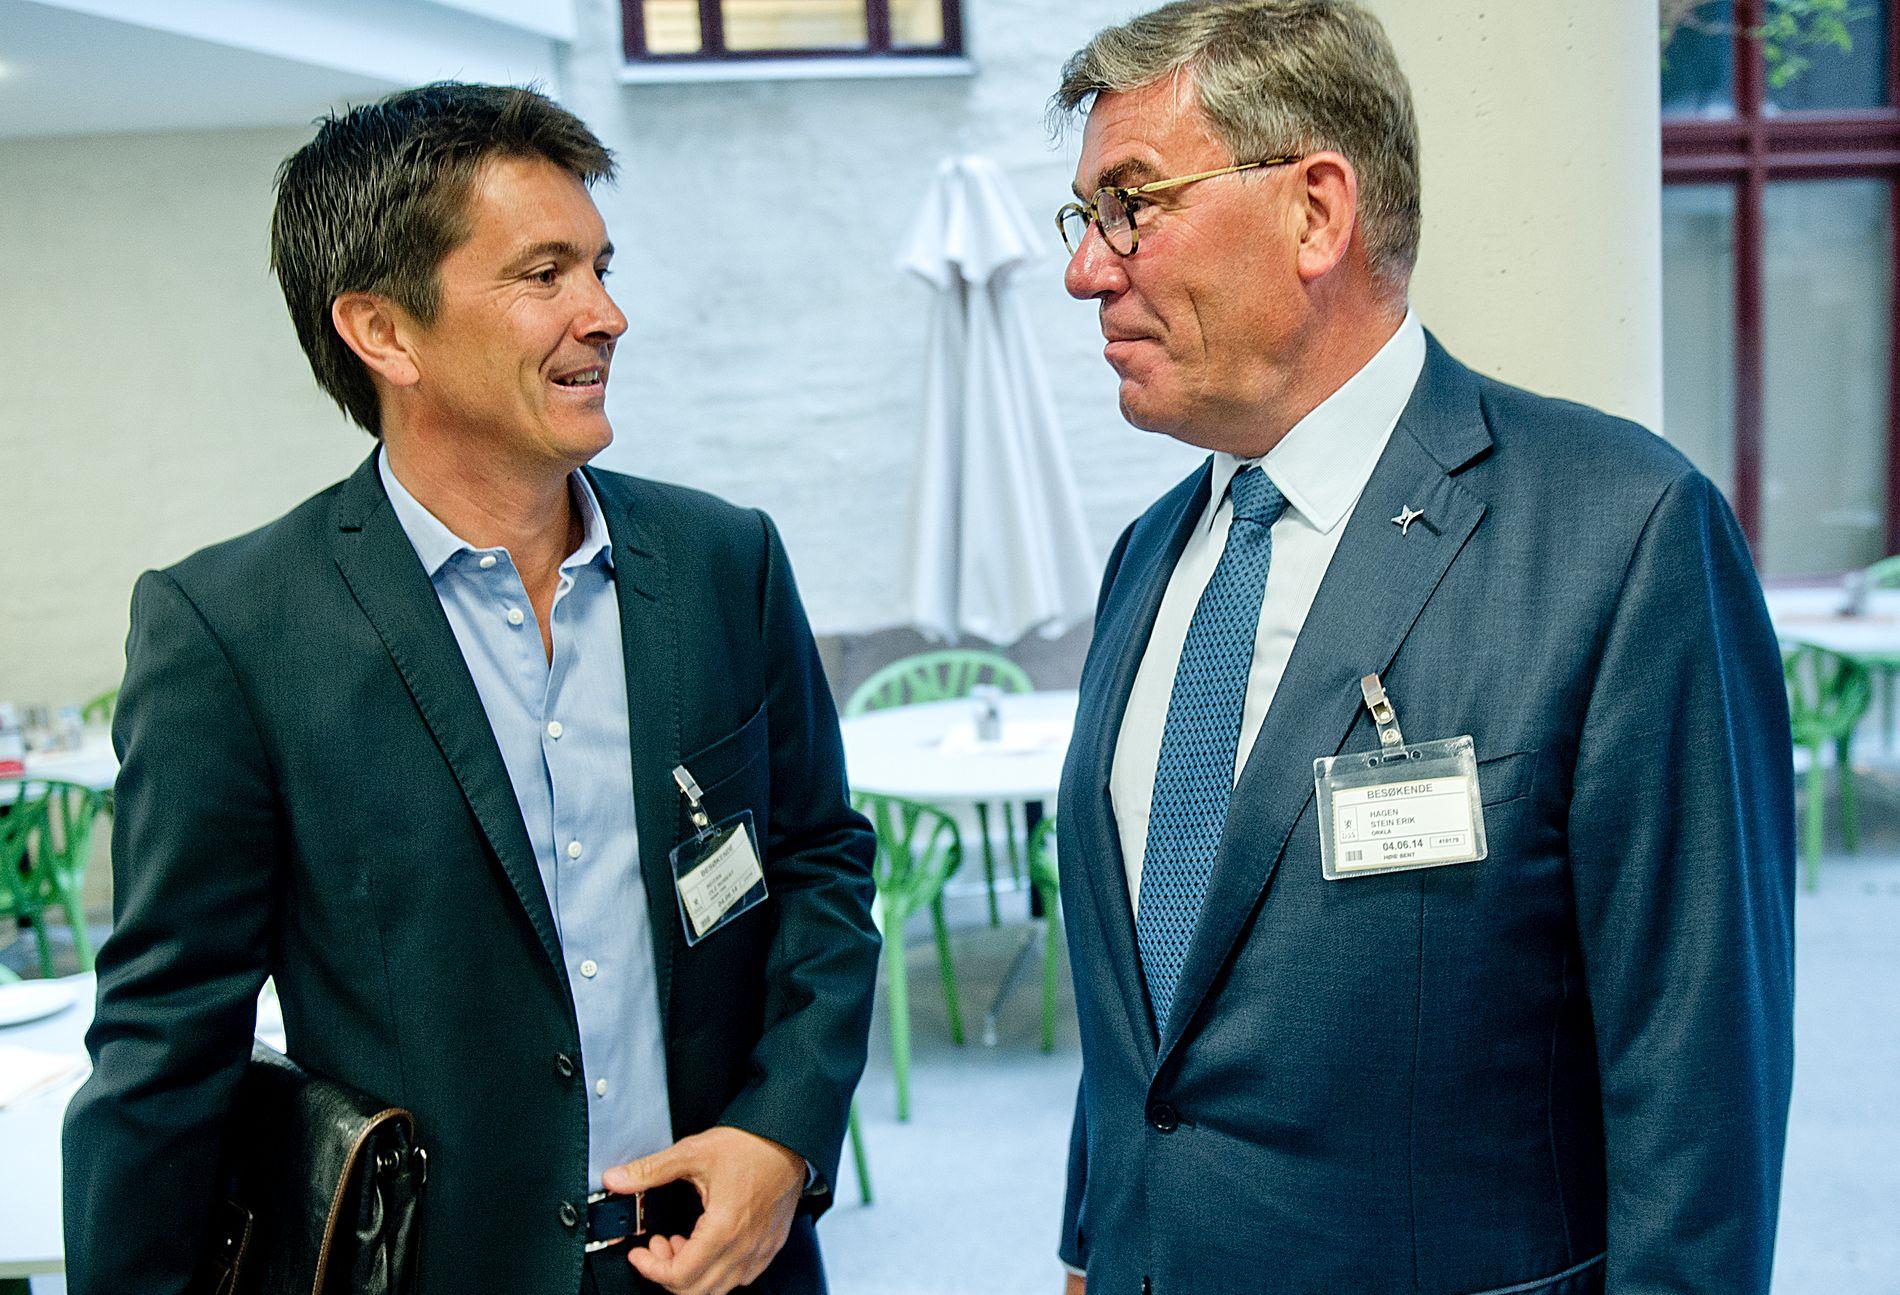 BILLIG-RÅD: Administrerende direktør i Rema 1000, Ole Robert Reitan, får klare råd fra tidligere konkurrent, Stein Erik Hagen (t.h.).